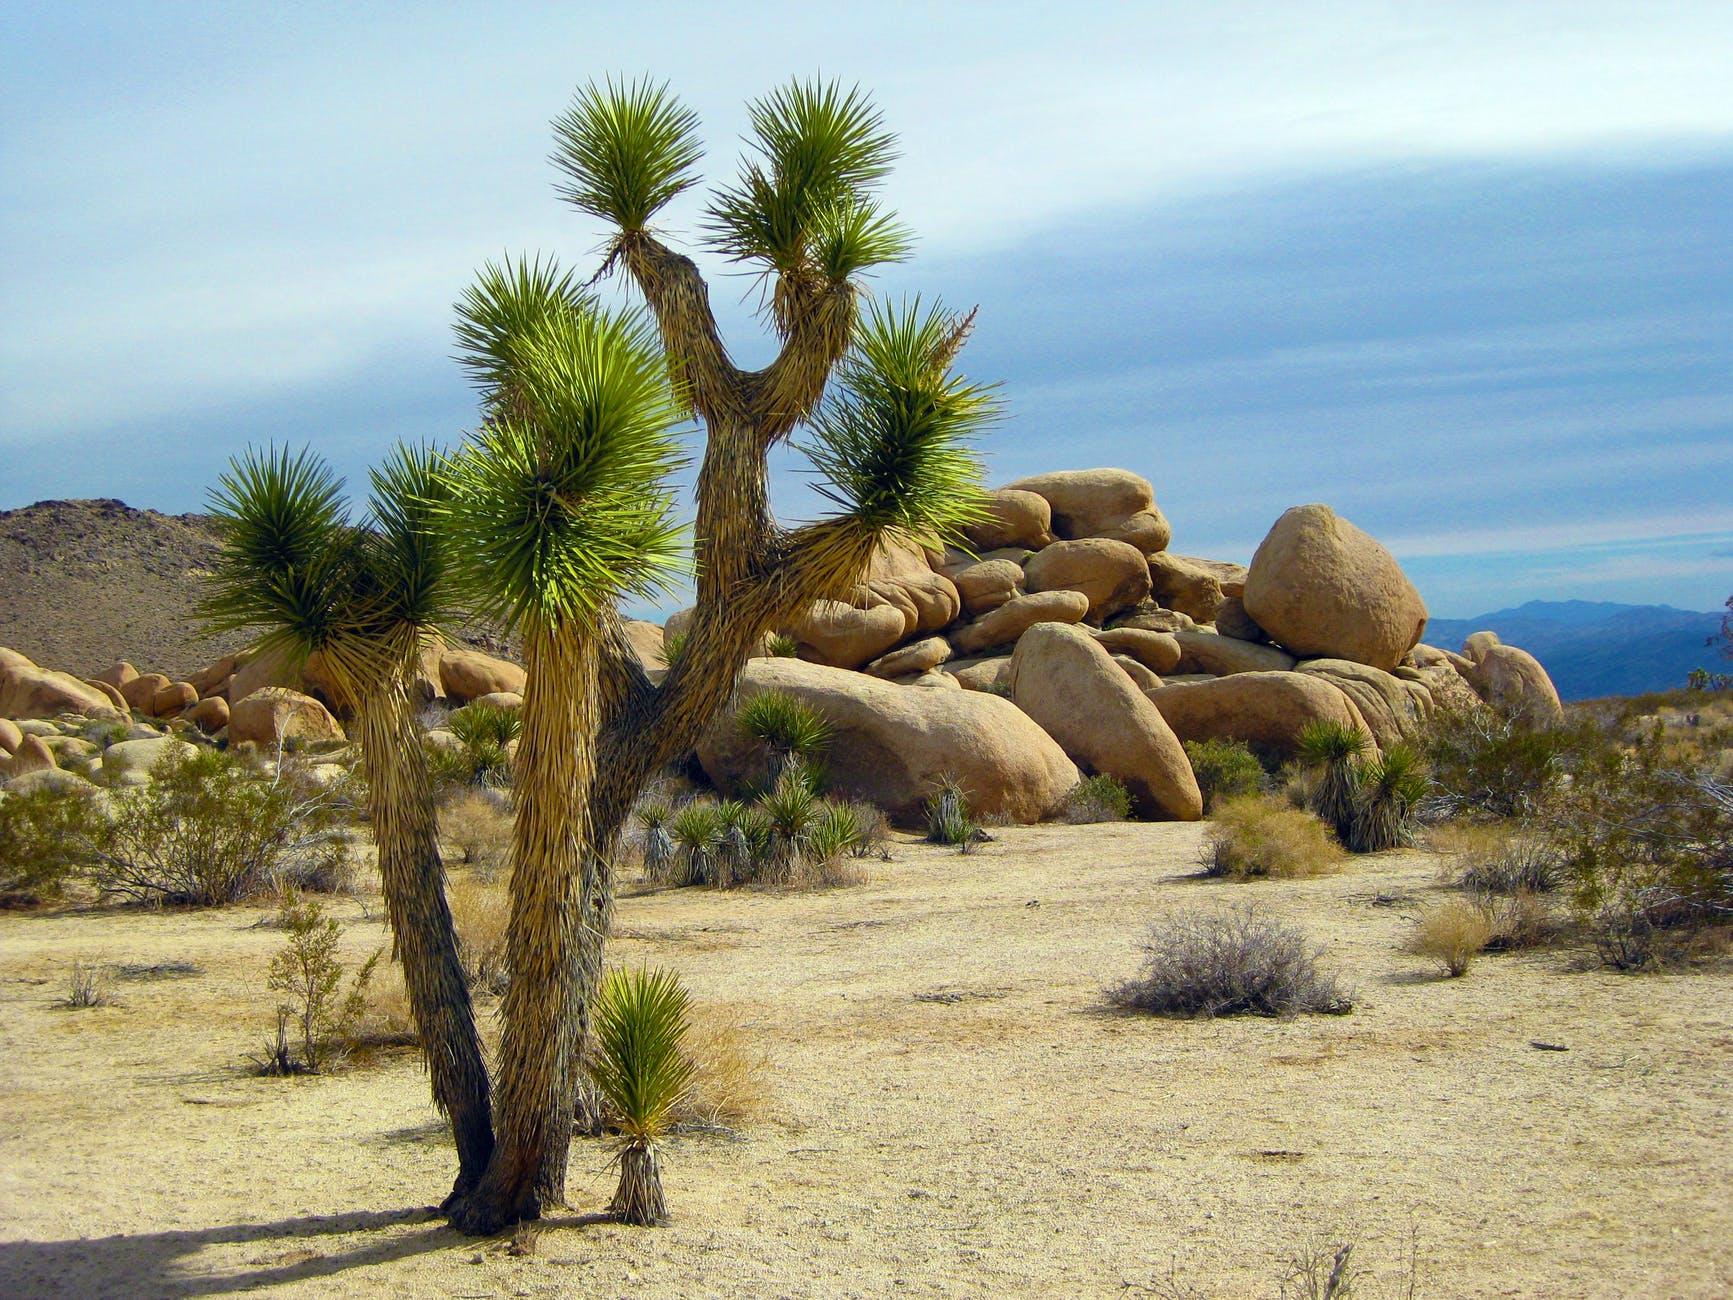 america arid bushes california